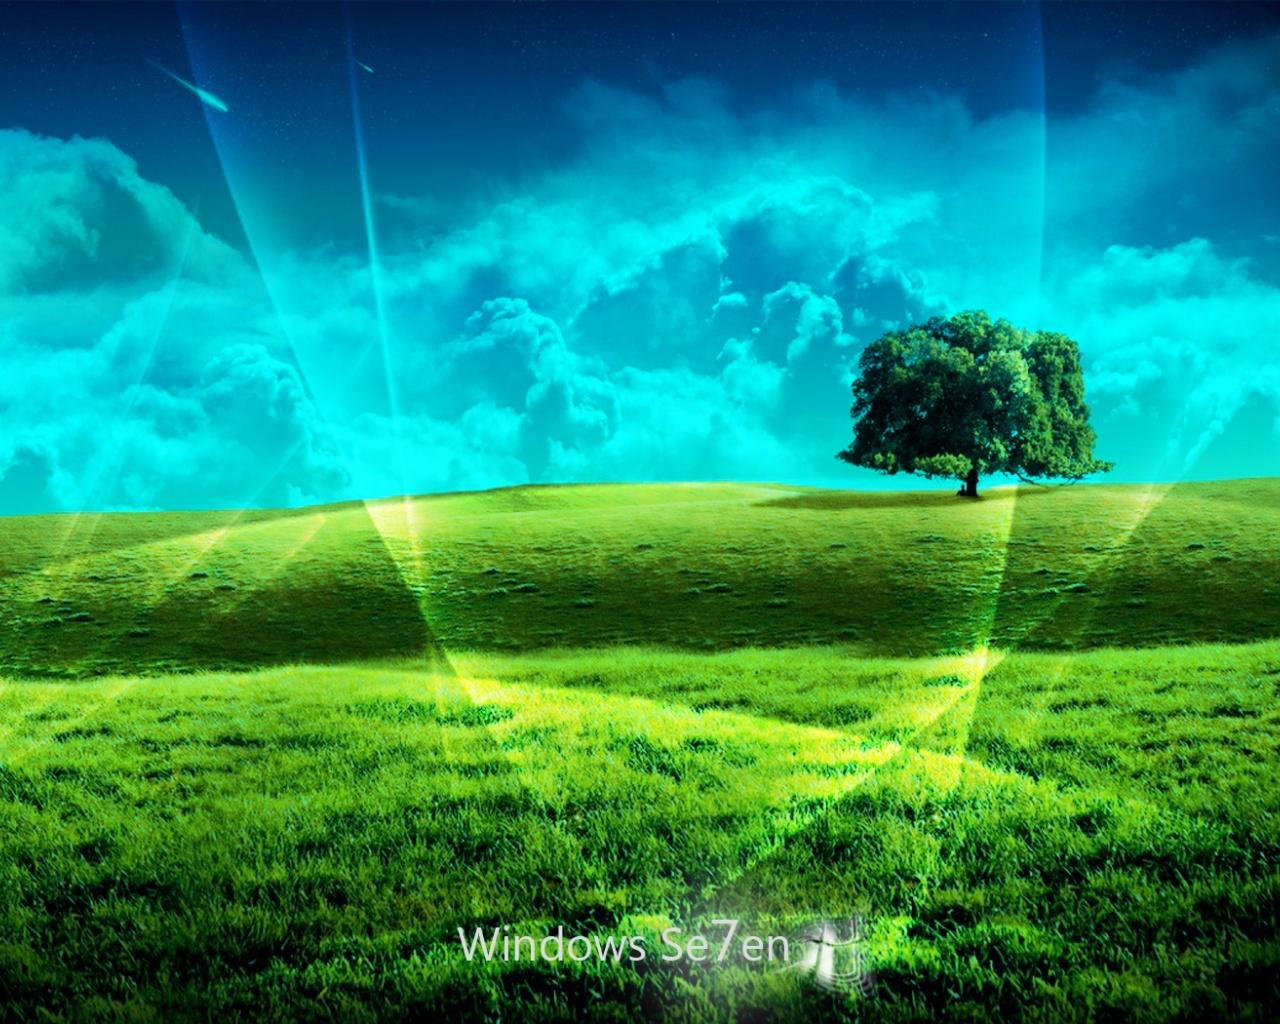 1280x1024 Windows 7 plain desktop PC and Mac wallpaper 1280x1024